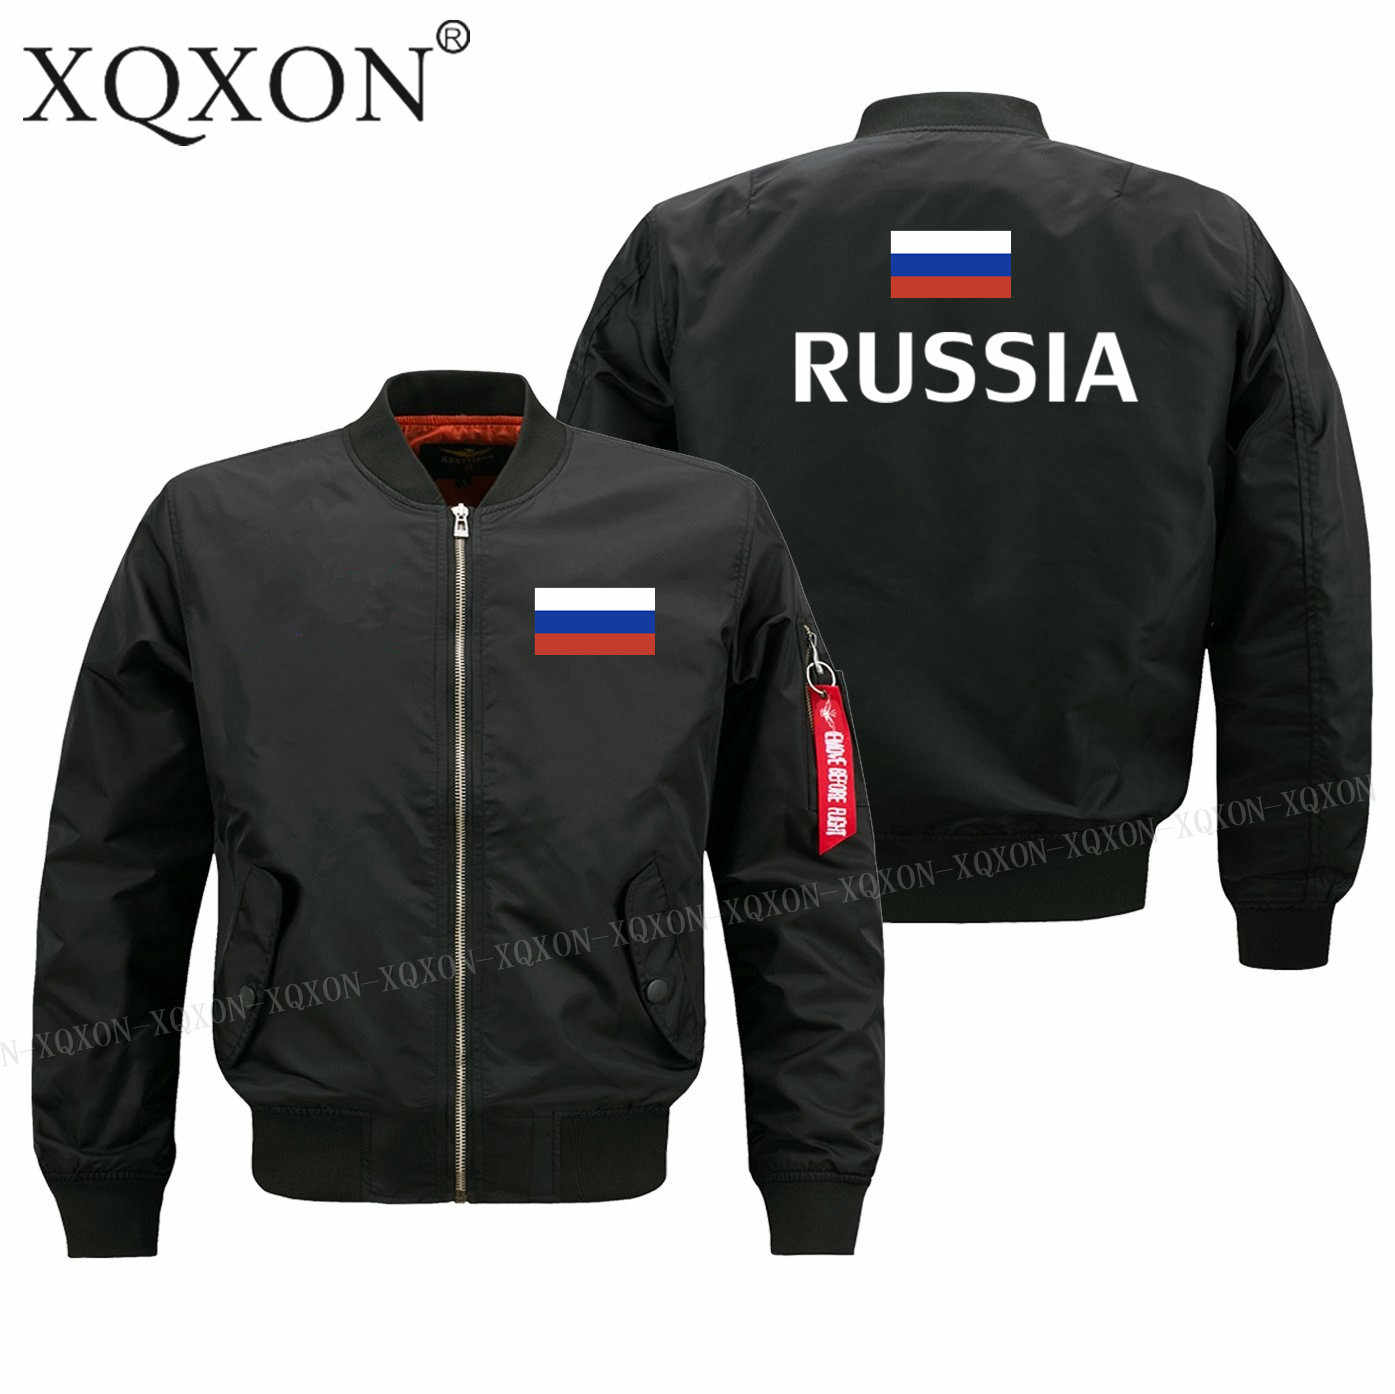 XQXON-2018 nuevos hombres chaqueta Rusia bandera impreso militar piloto Hombre  Abrigos chaquetas J164 1a882c71cff